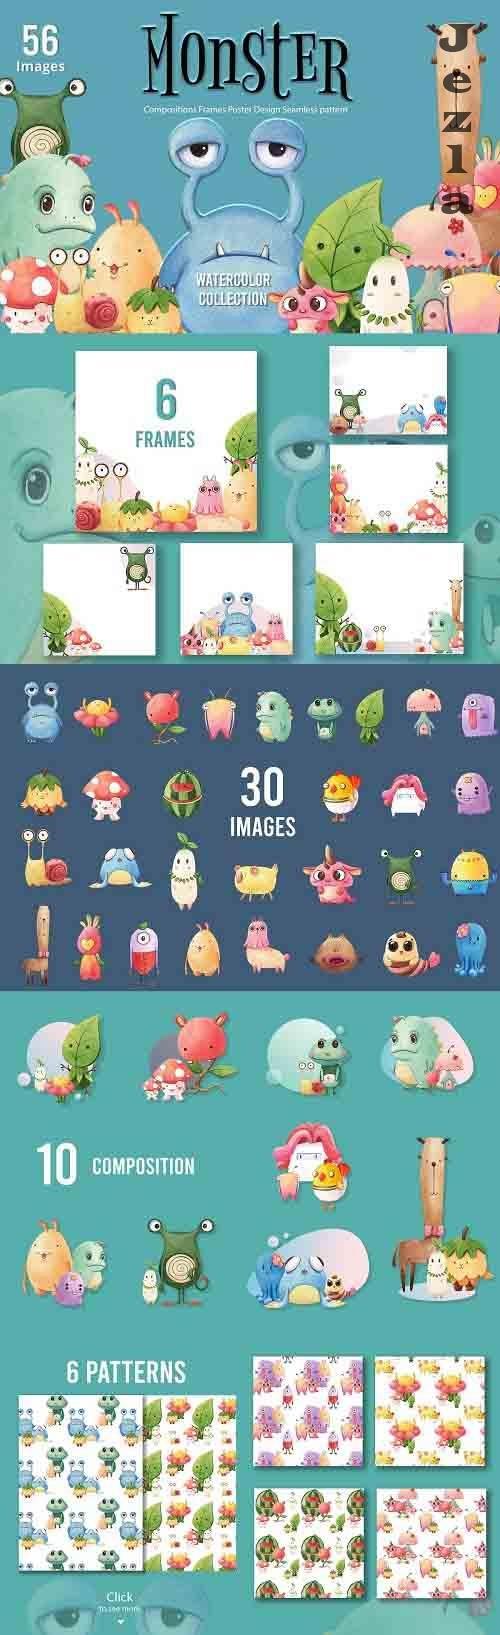 Monsters Watercolor - 5671748